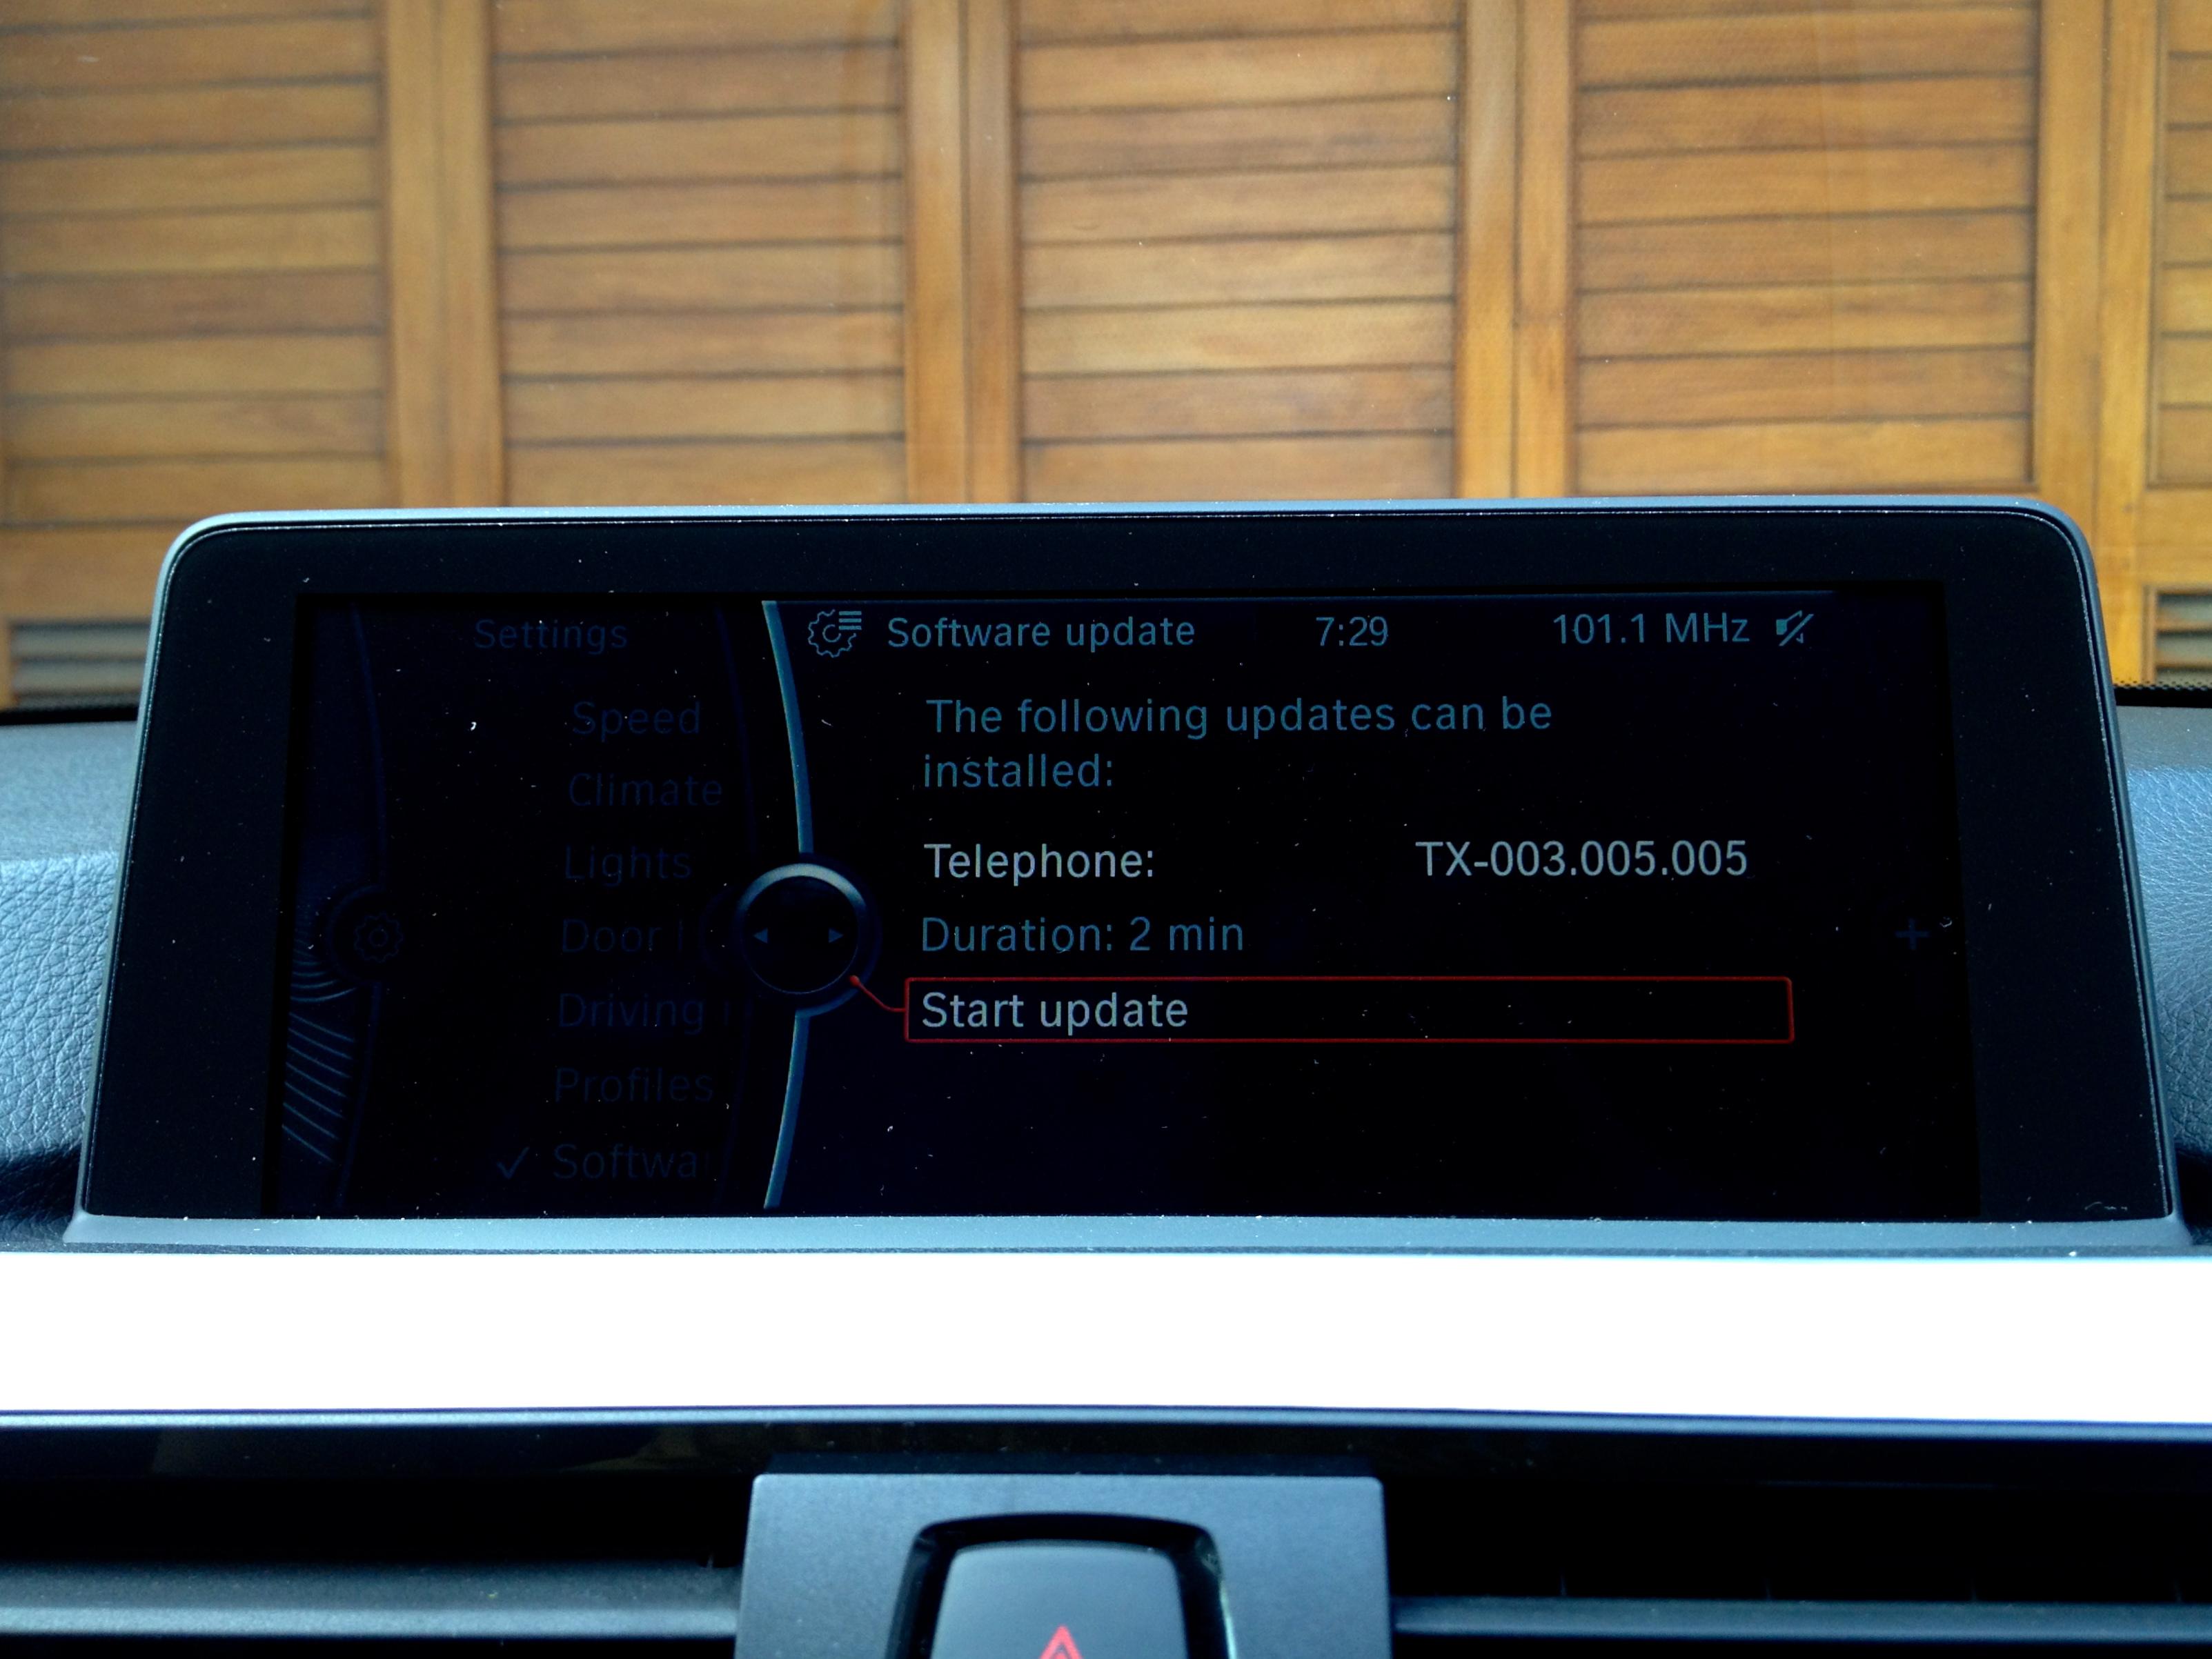 Updating BMW 2012 F30 iDrive Software – Andri Yadi